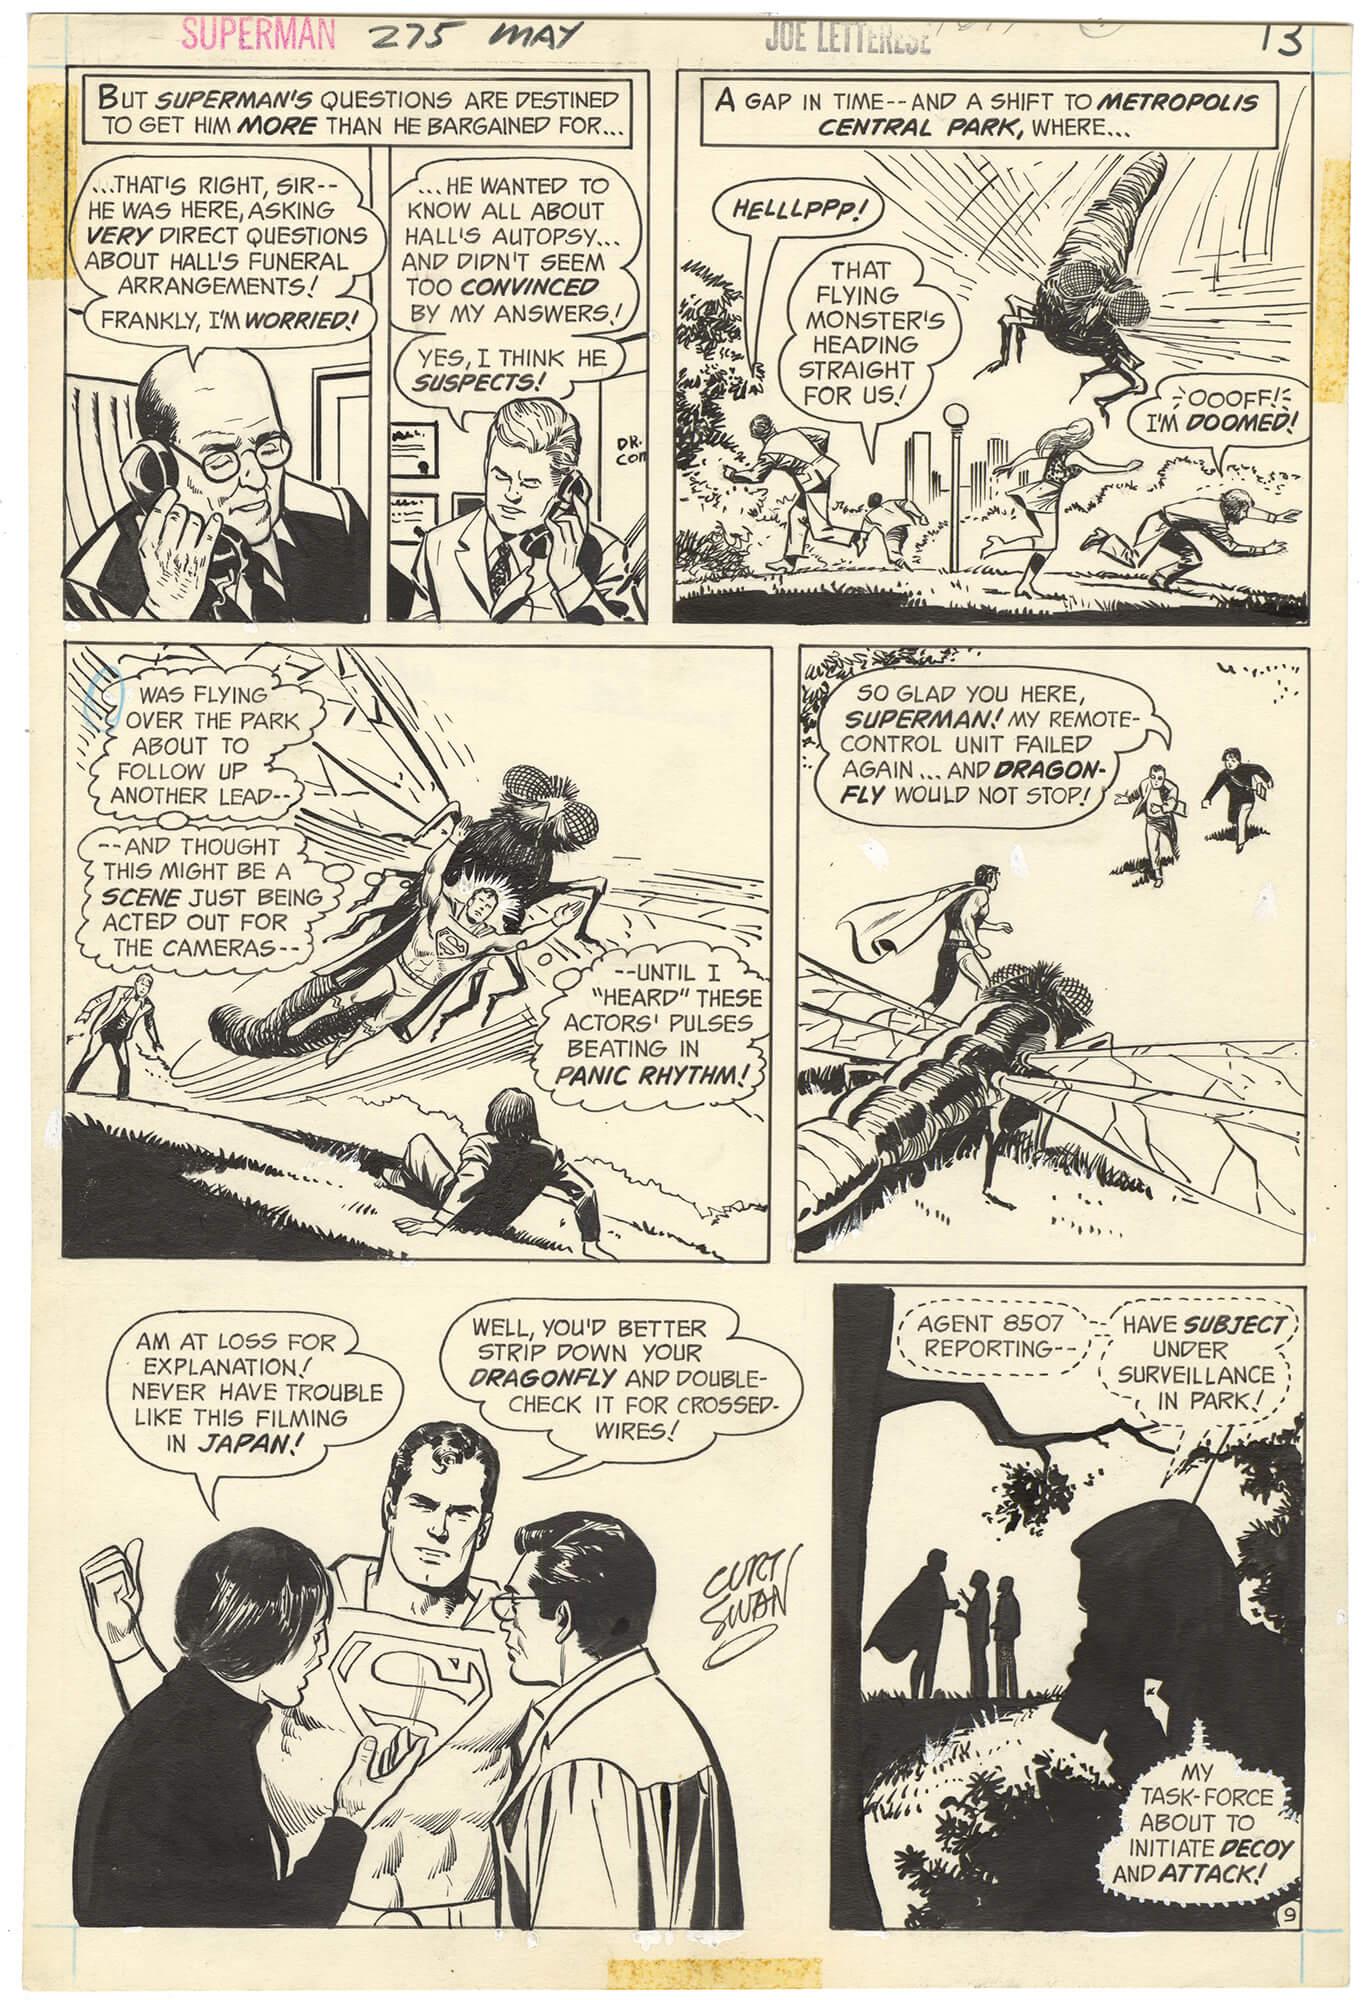 Superman #275 p9 (Signed)